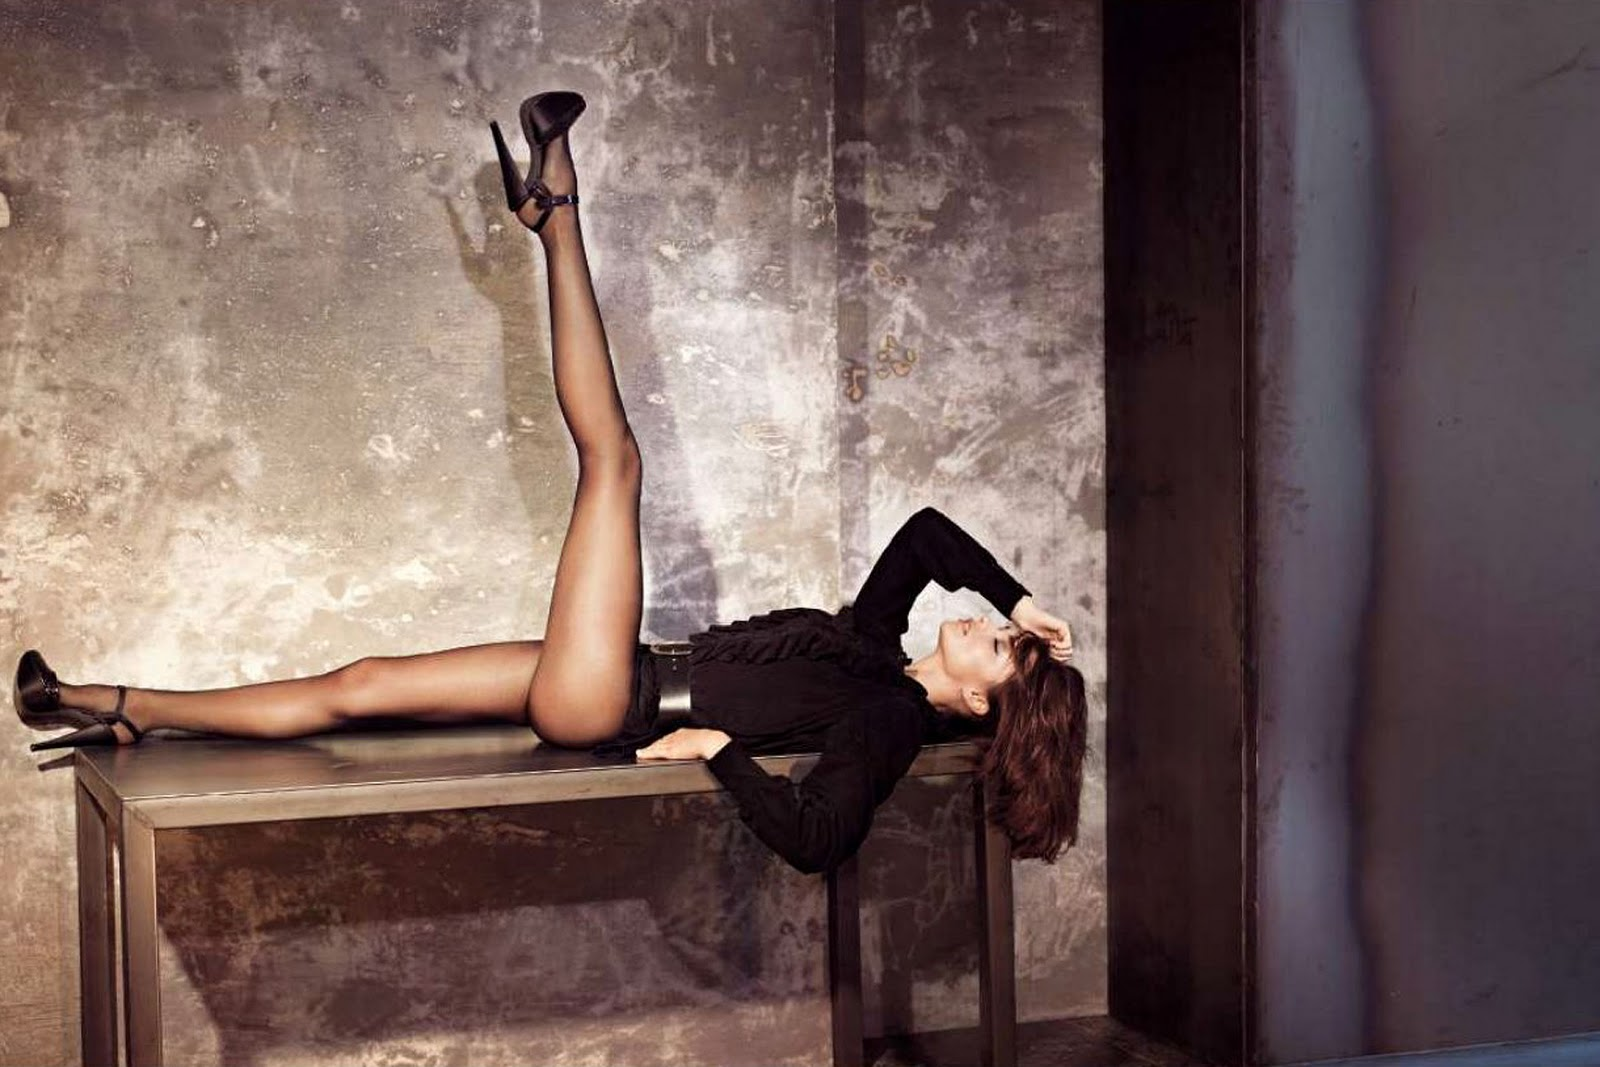 http://2.bp.blogspot.com/_775ESC4svi8/TSkpWK9tbTI/AAAAAAAAA98/T6rlE0sHQ1k/s1600/miranda-kerr-sexy-elle-09.jpg